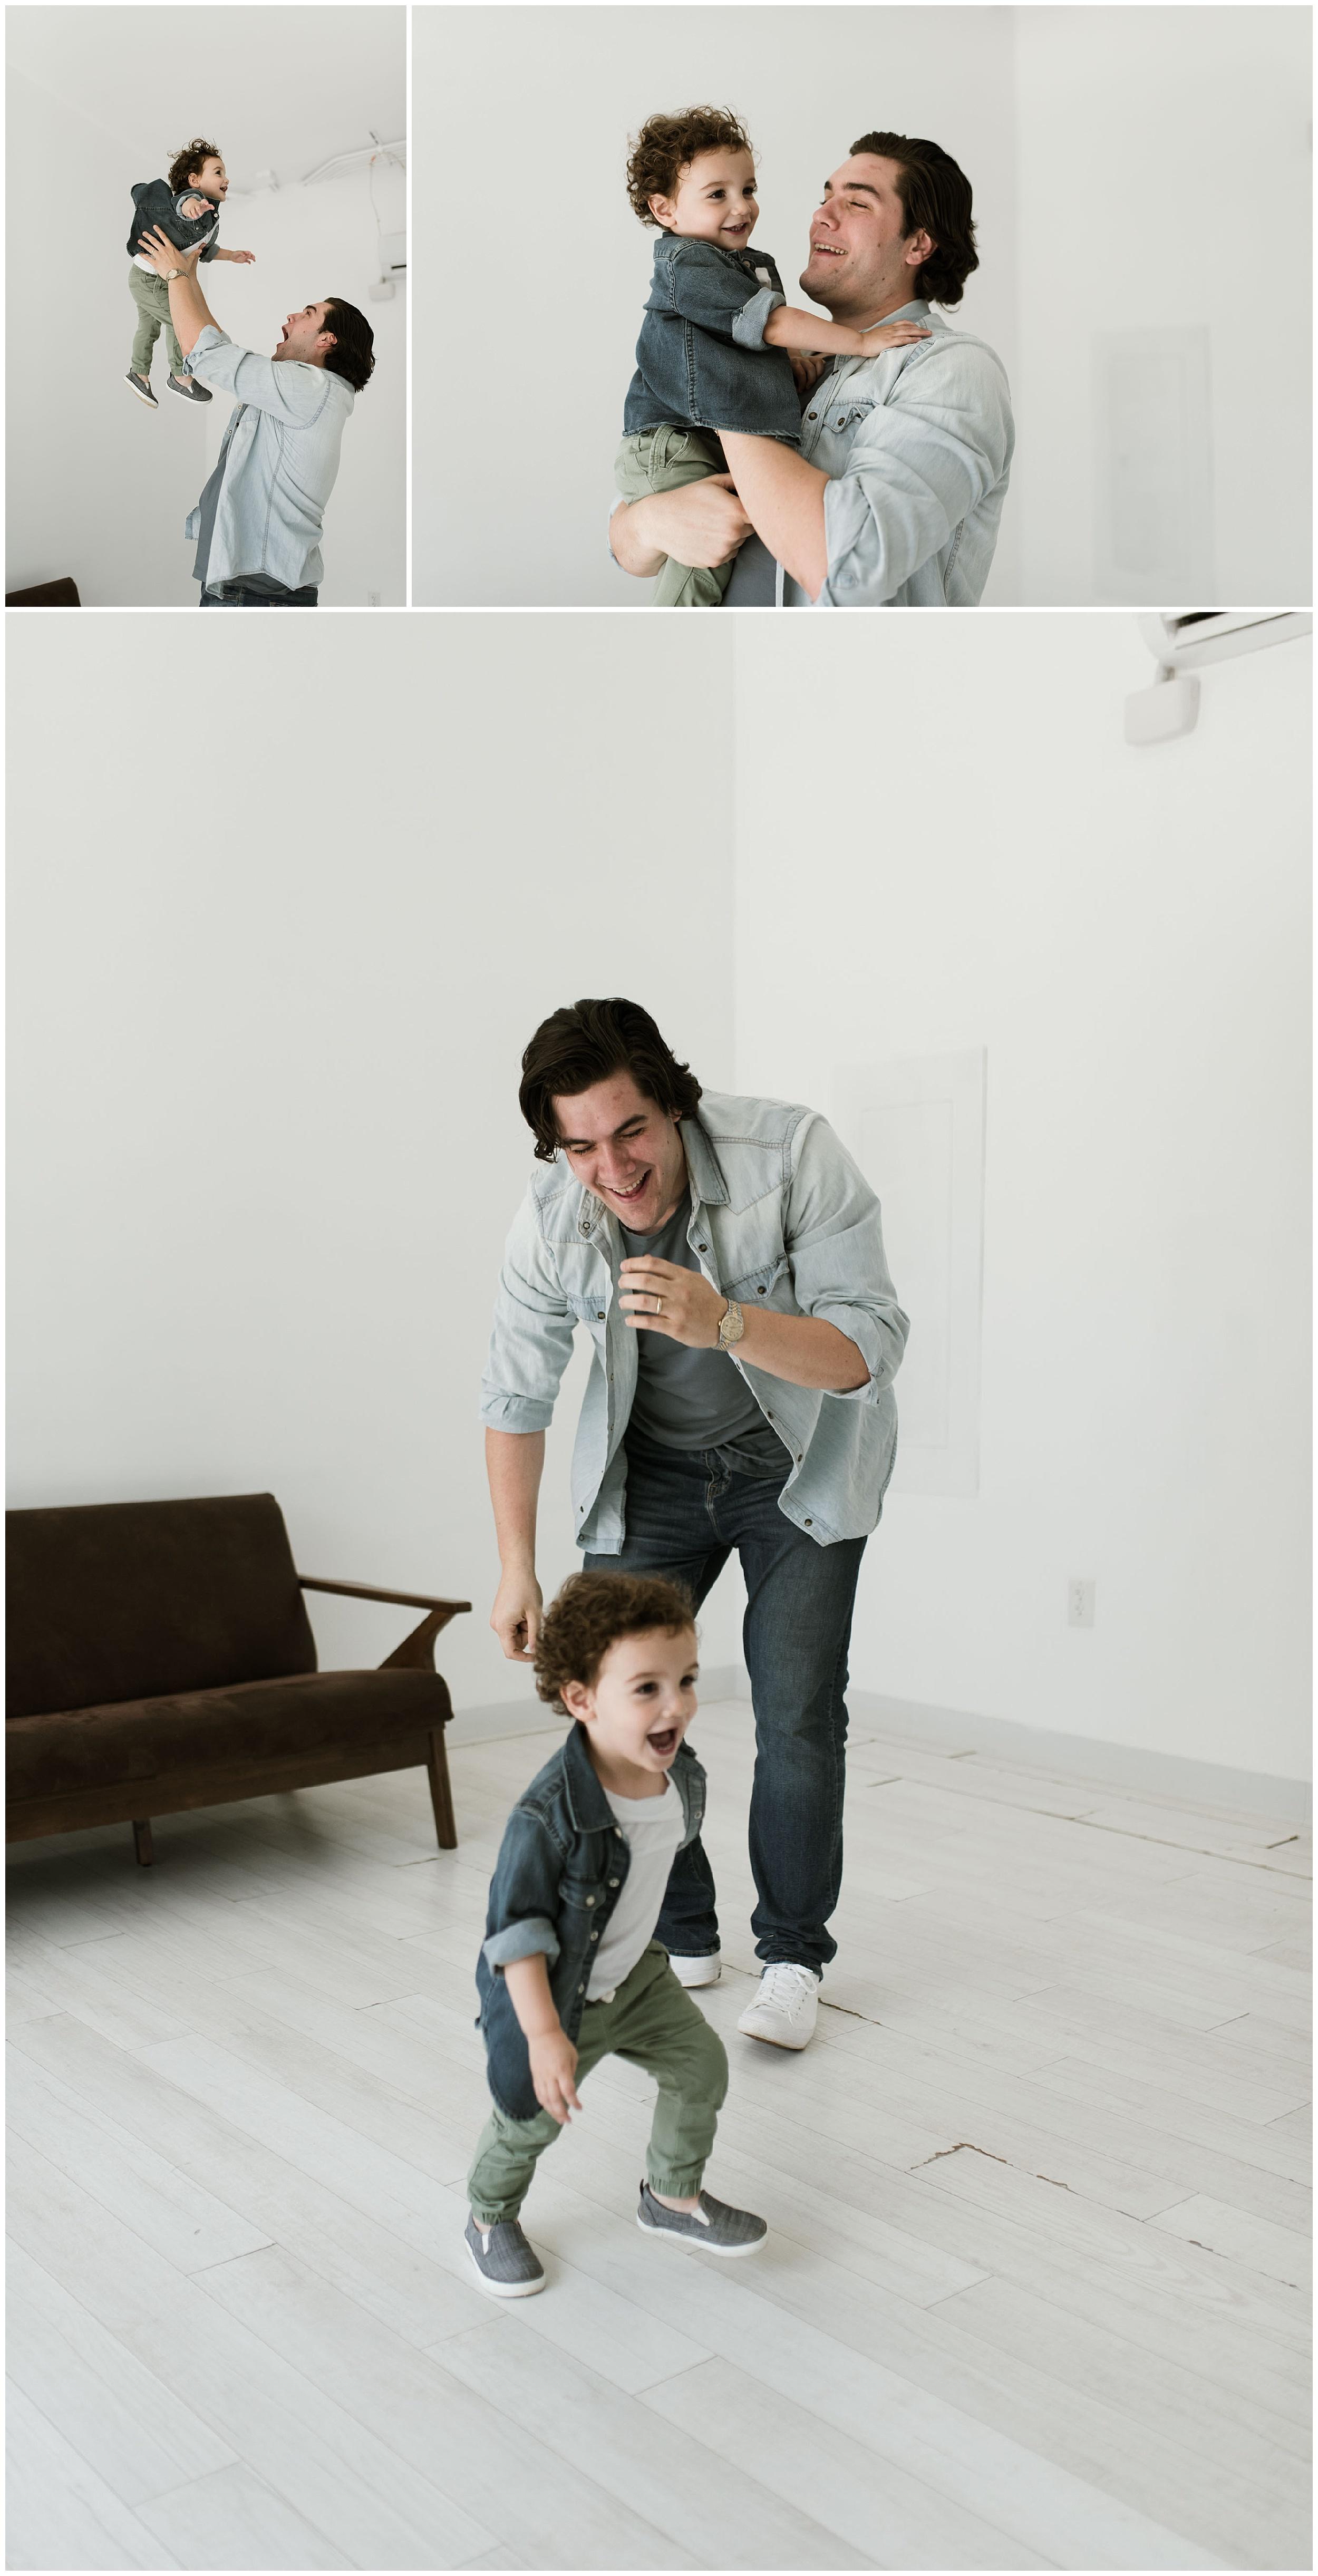 Fort Worth Family Photographer | Lumen Room Fort Worth | Fort Worth Lifestyle Photographer | www.jordanmitchellphotography.com